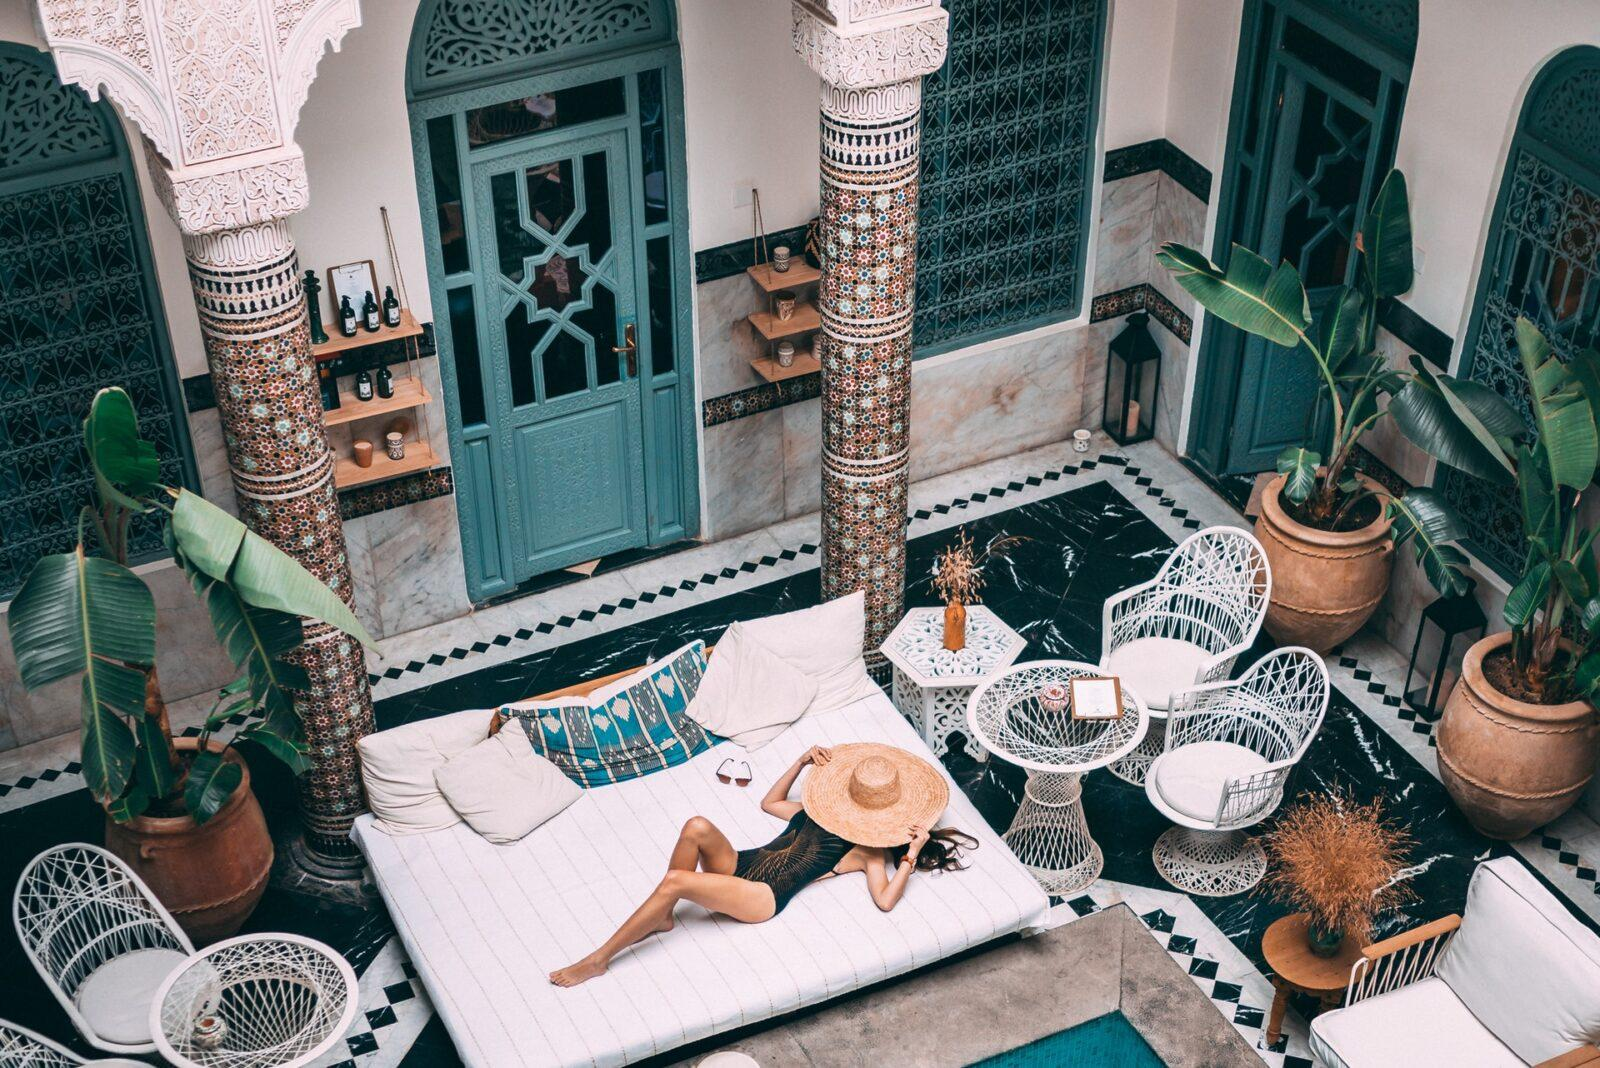 pexels taryn elliott 3889843 - Guide Morocco Tours